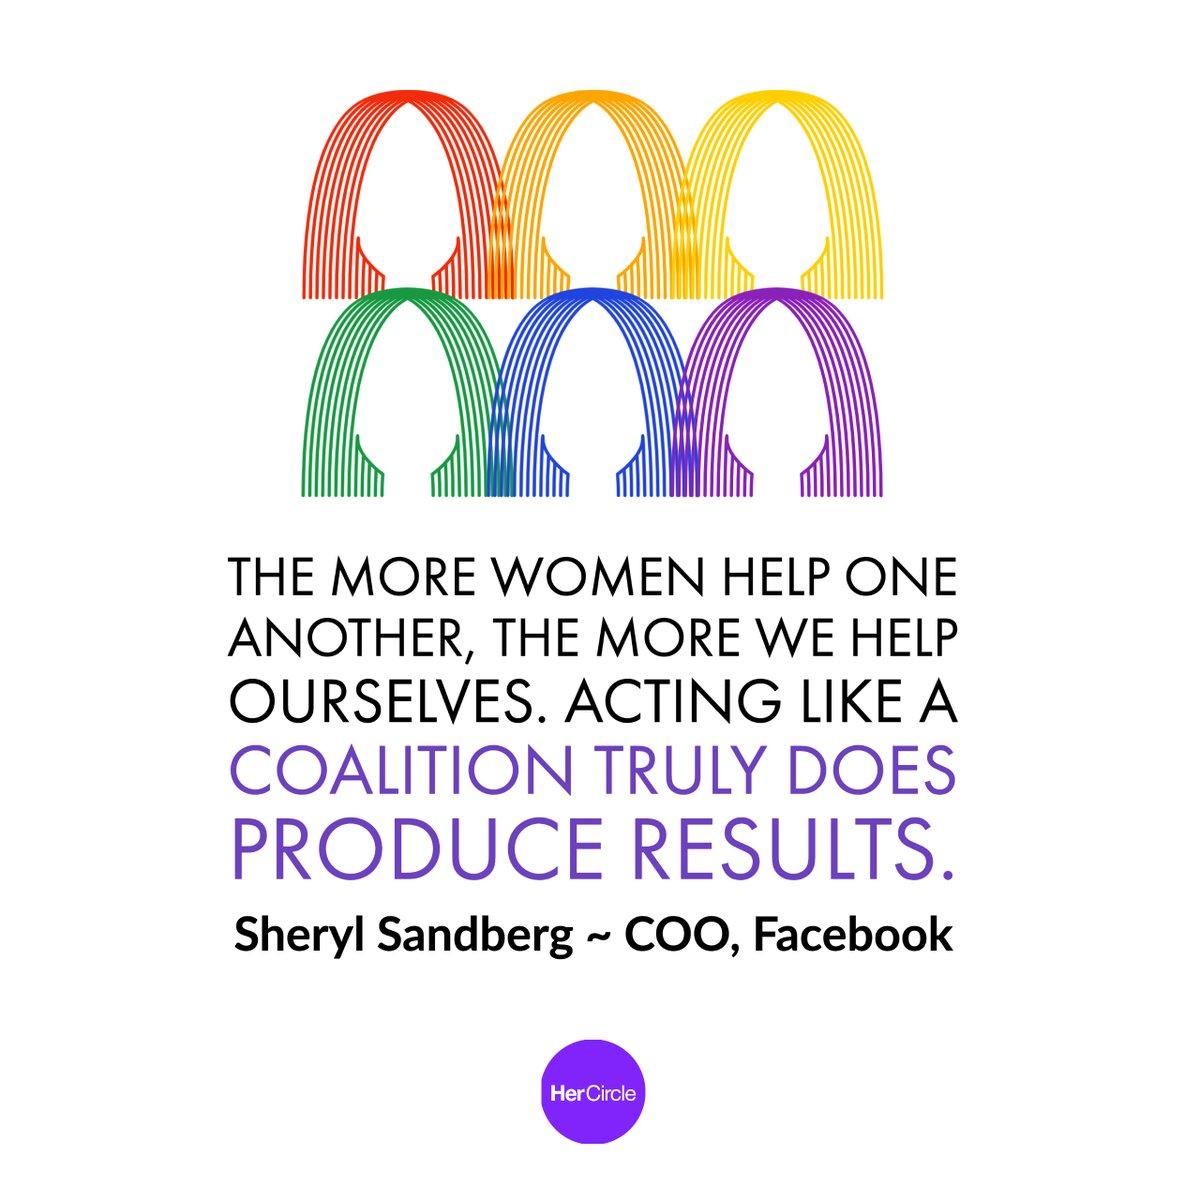 Acting like a coalition truly does produce results. 💜@sherylsandberg - #wednesdaywisdom #wednesdaymotivation #wednesdayvibes #HerCircle #womeninbusiness #womenintech #femalefounders #women #Hustle #WomenEmpowerment #womenleaders #FemaleFounders #GirlBoss #TheFutureIsFemale #She